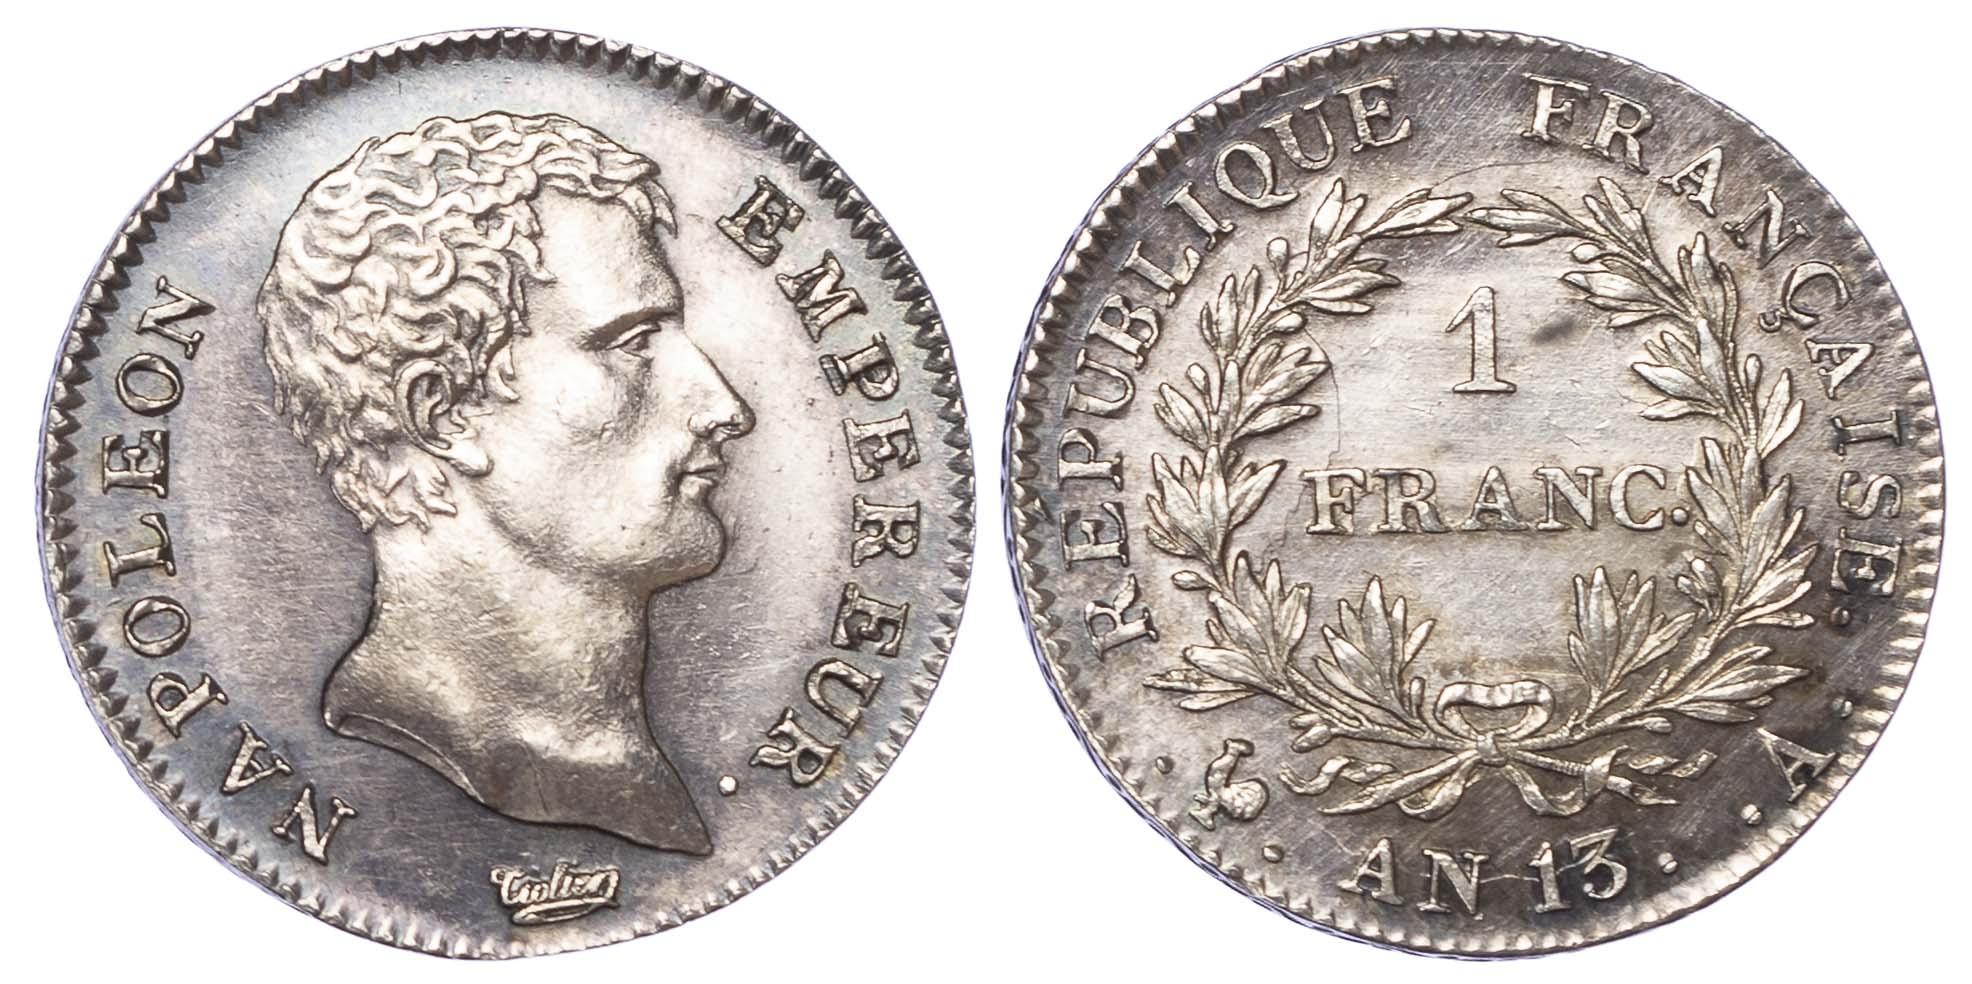 France, Napoleon (First Empire, 1804-1814), silver Franc